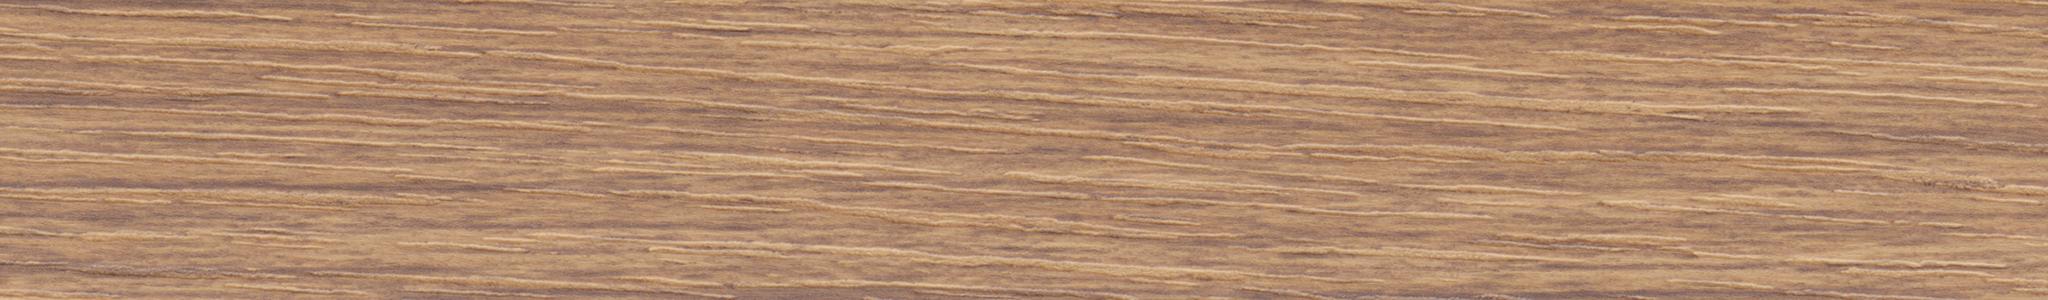 HD 292084 Кромка ABS Золотой Тик - Поры - Мягкая Матовая